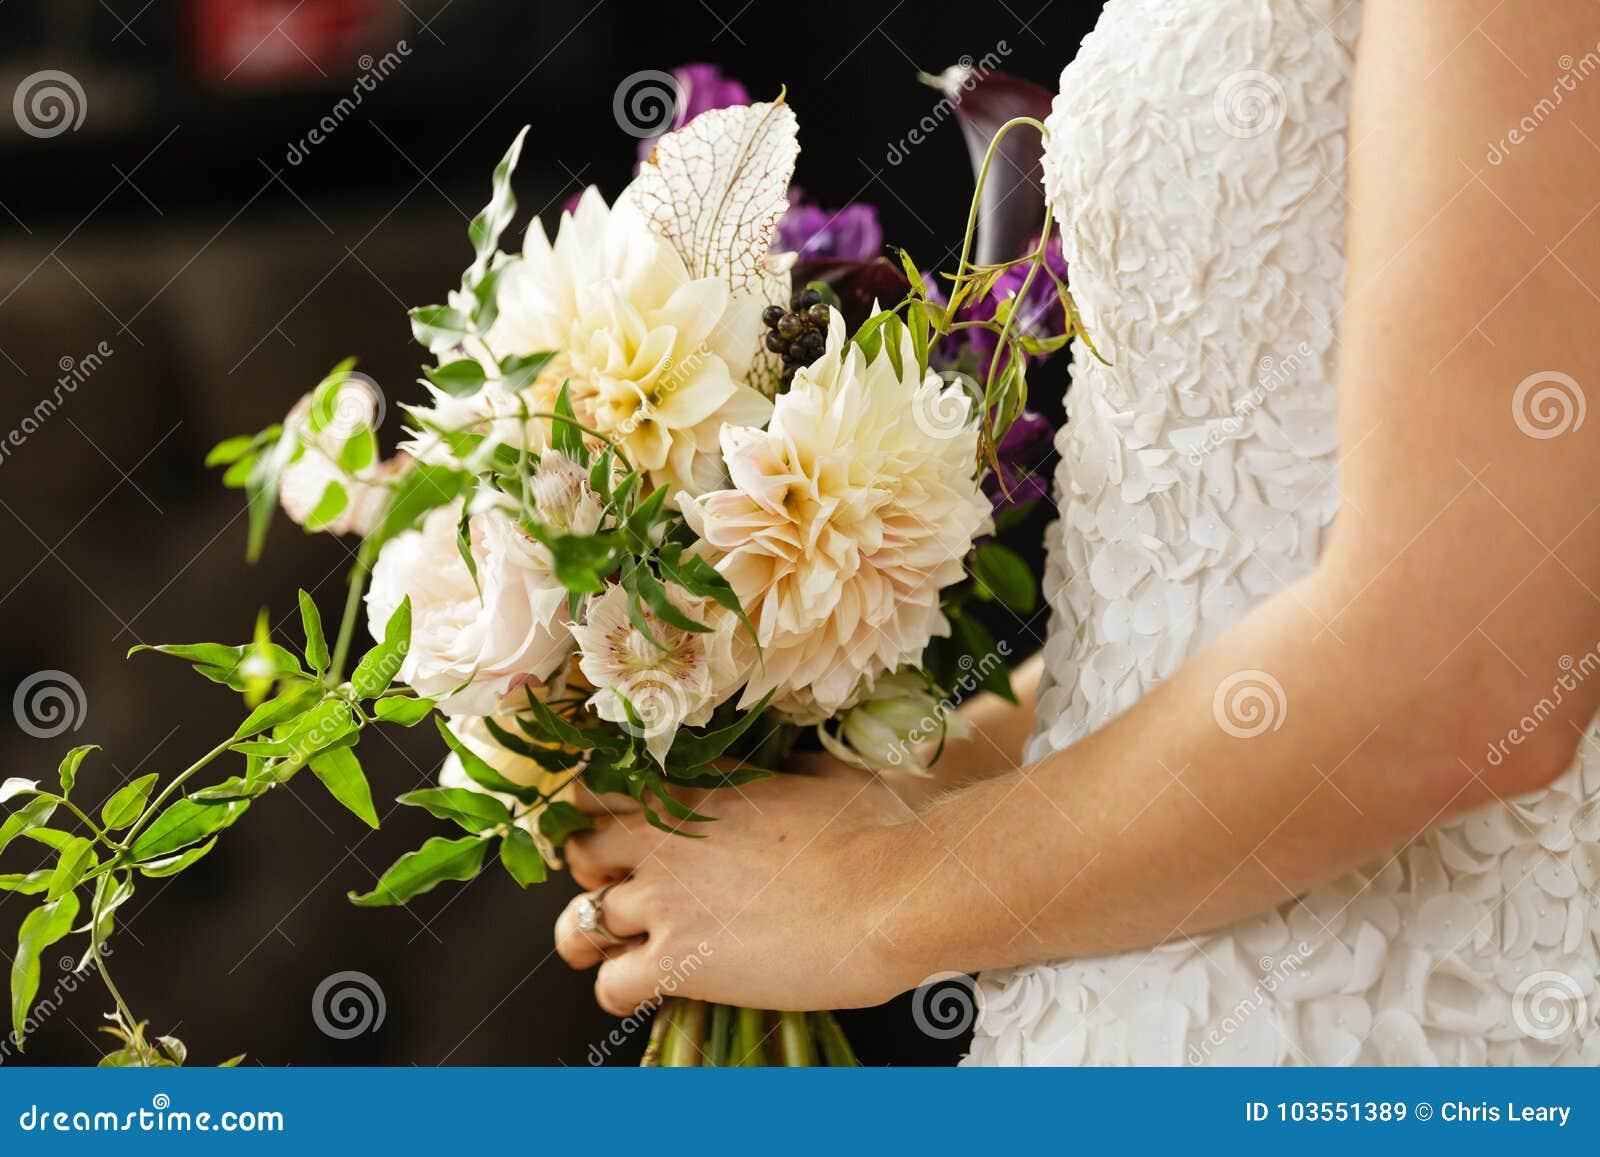 Bride bridesmaid holding wedding flower bouquet stock image image a bride and bridesmaid holding a wedding flowers bouquet closeup izmirmasajfo